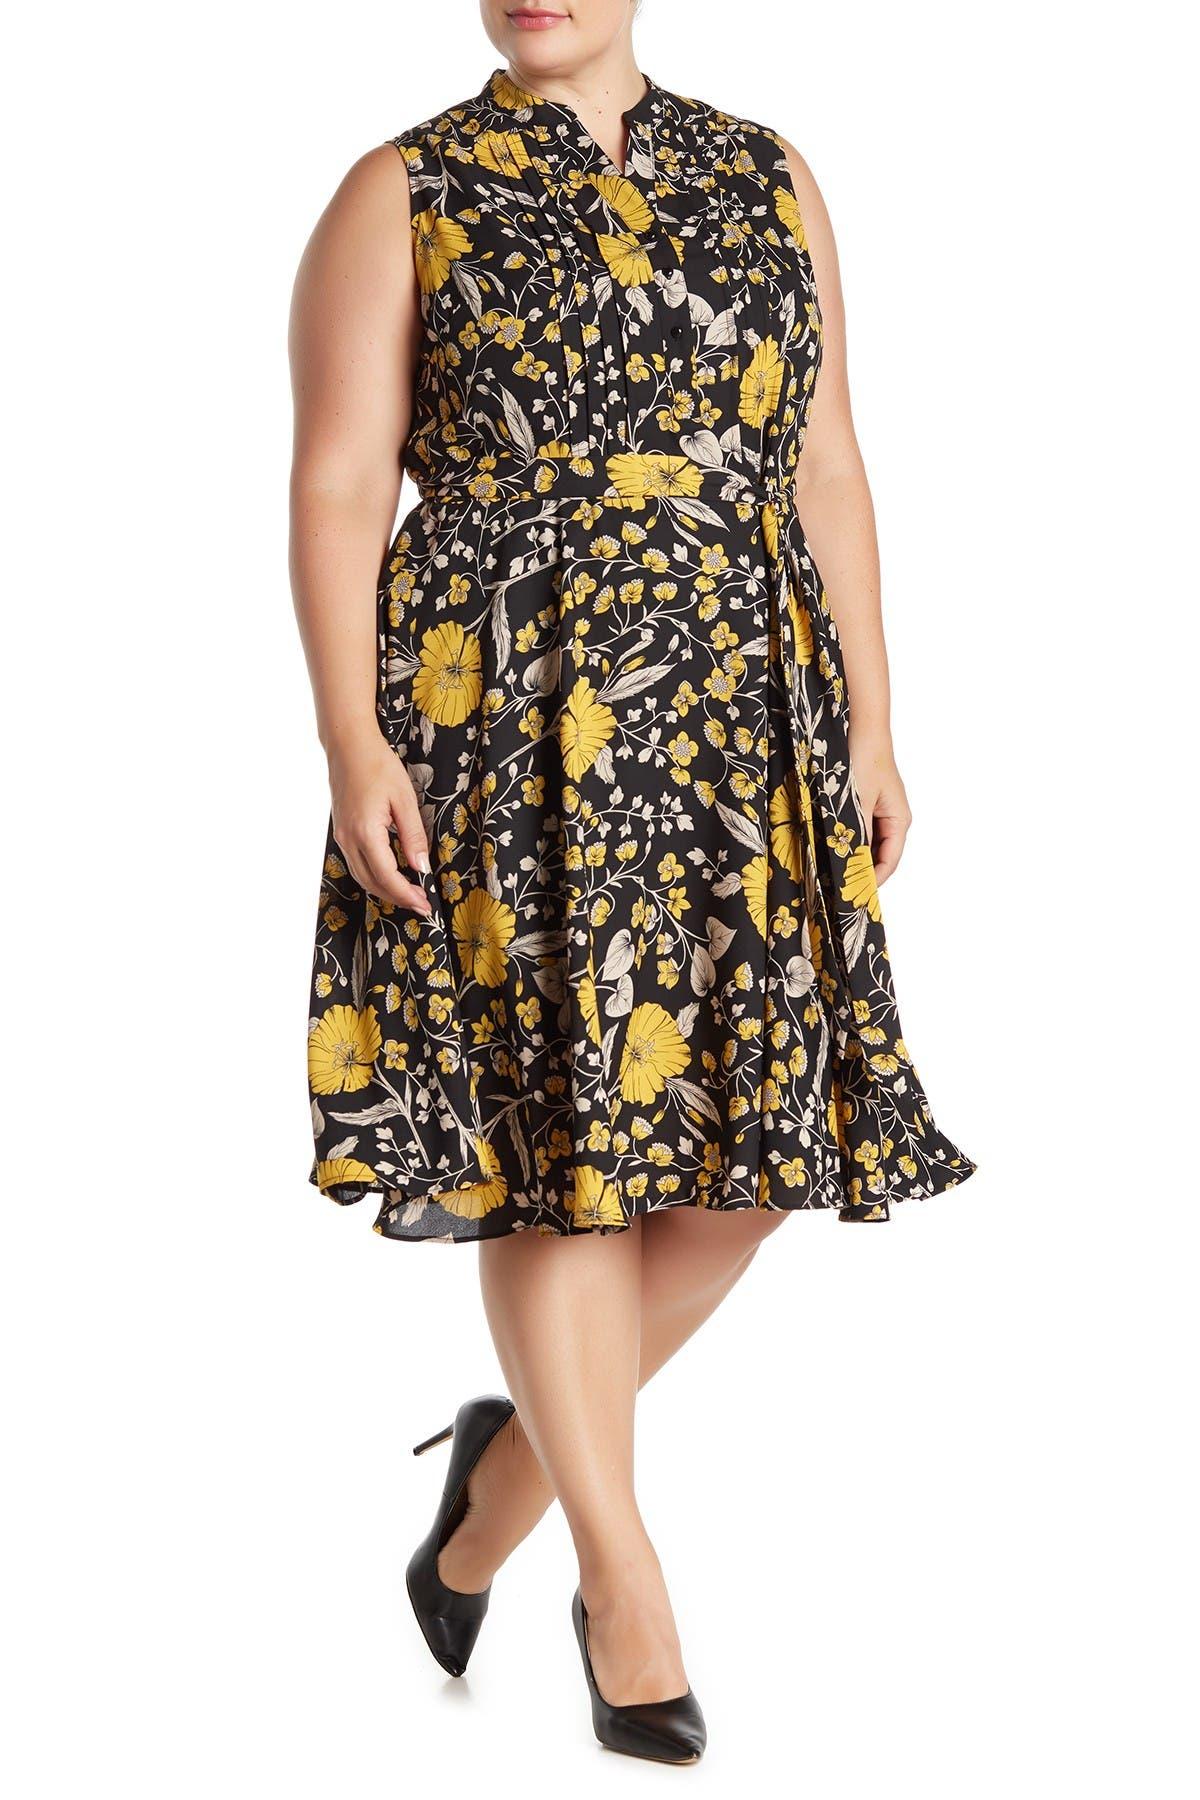 Image of NANETTE nanette lepore Sleeveless Floral Print Pintuck Pleat Dress